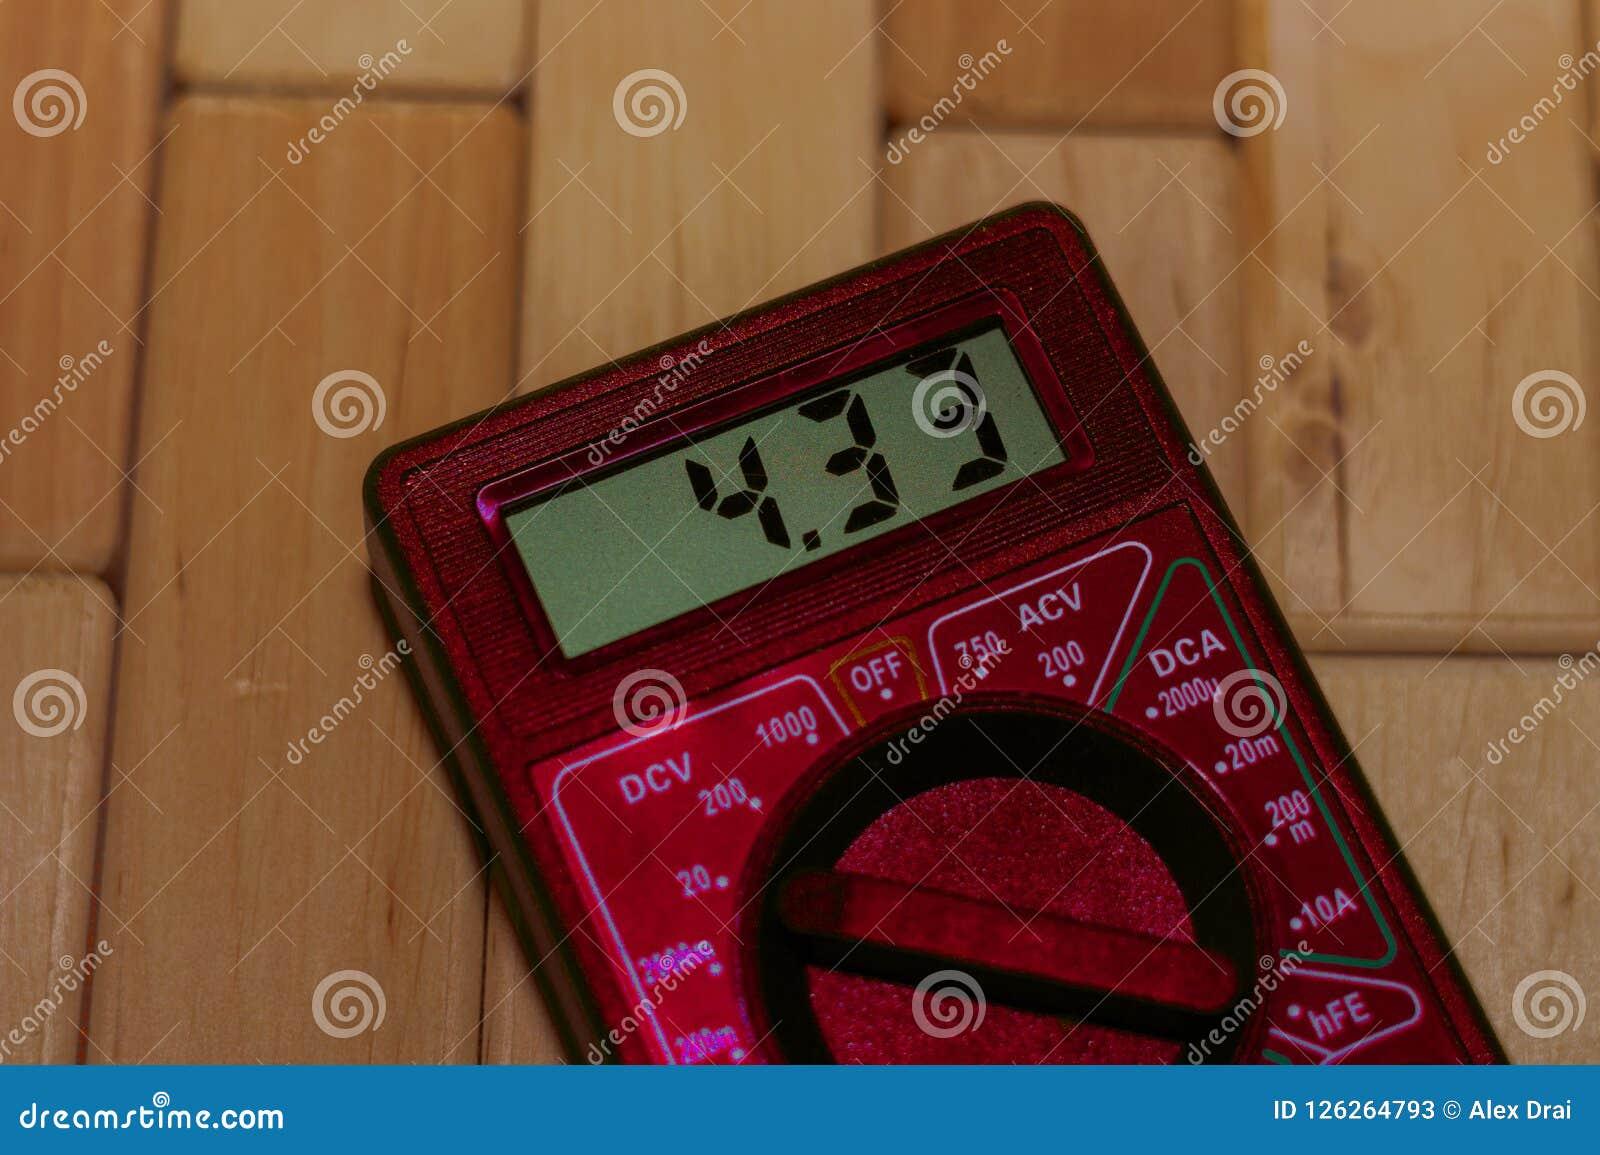 Rode digitale metende multimeter op houten vloer Het toont 4 33V of volledig geladen batterij Omvat voltmeter, ampermeter, ohmmet